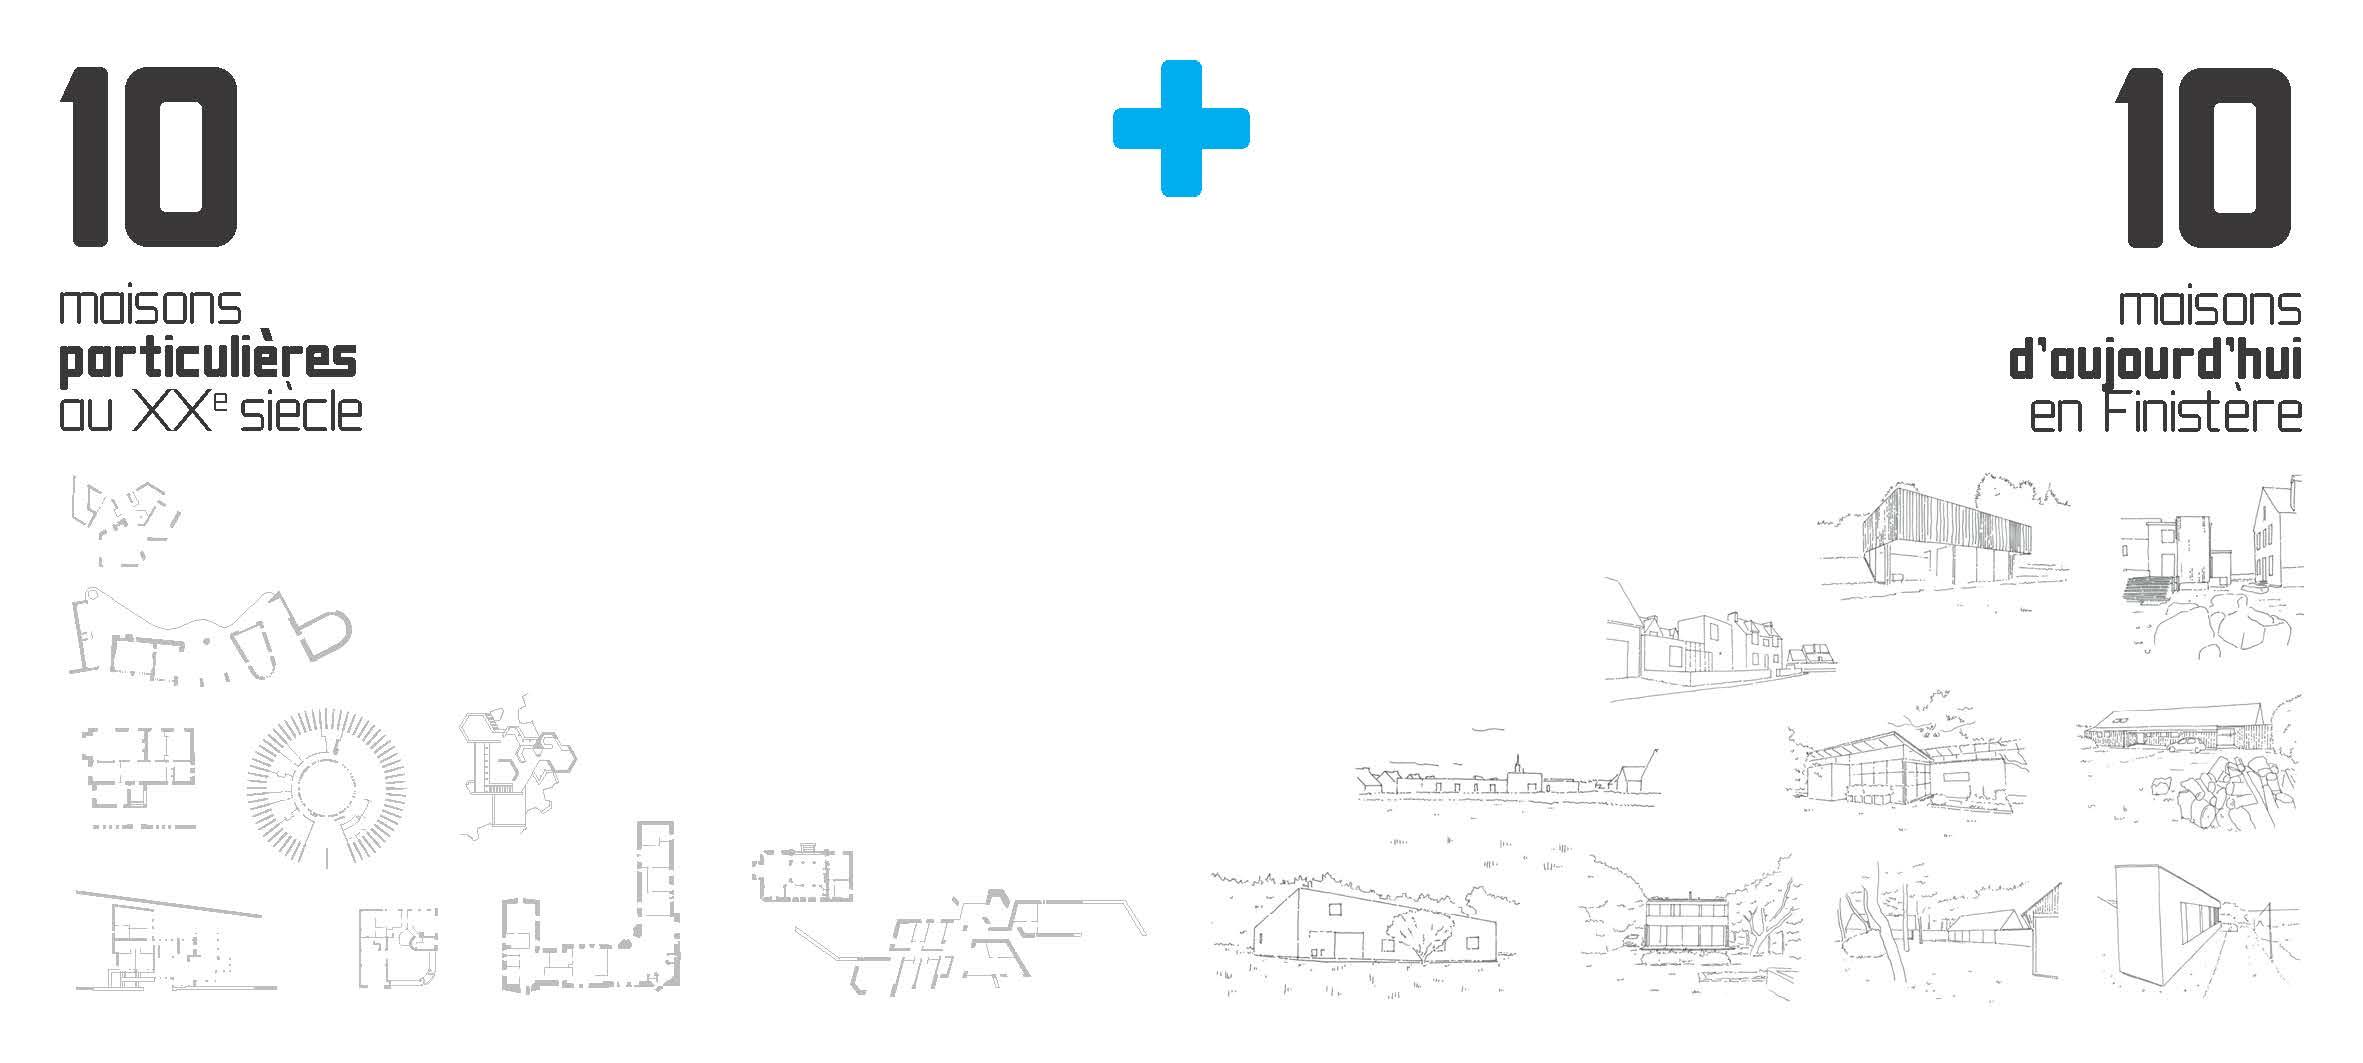 vernissage-10plus10-ecopole-cca-bzh-v2_page_1.jpg